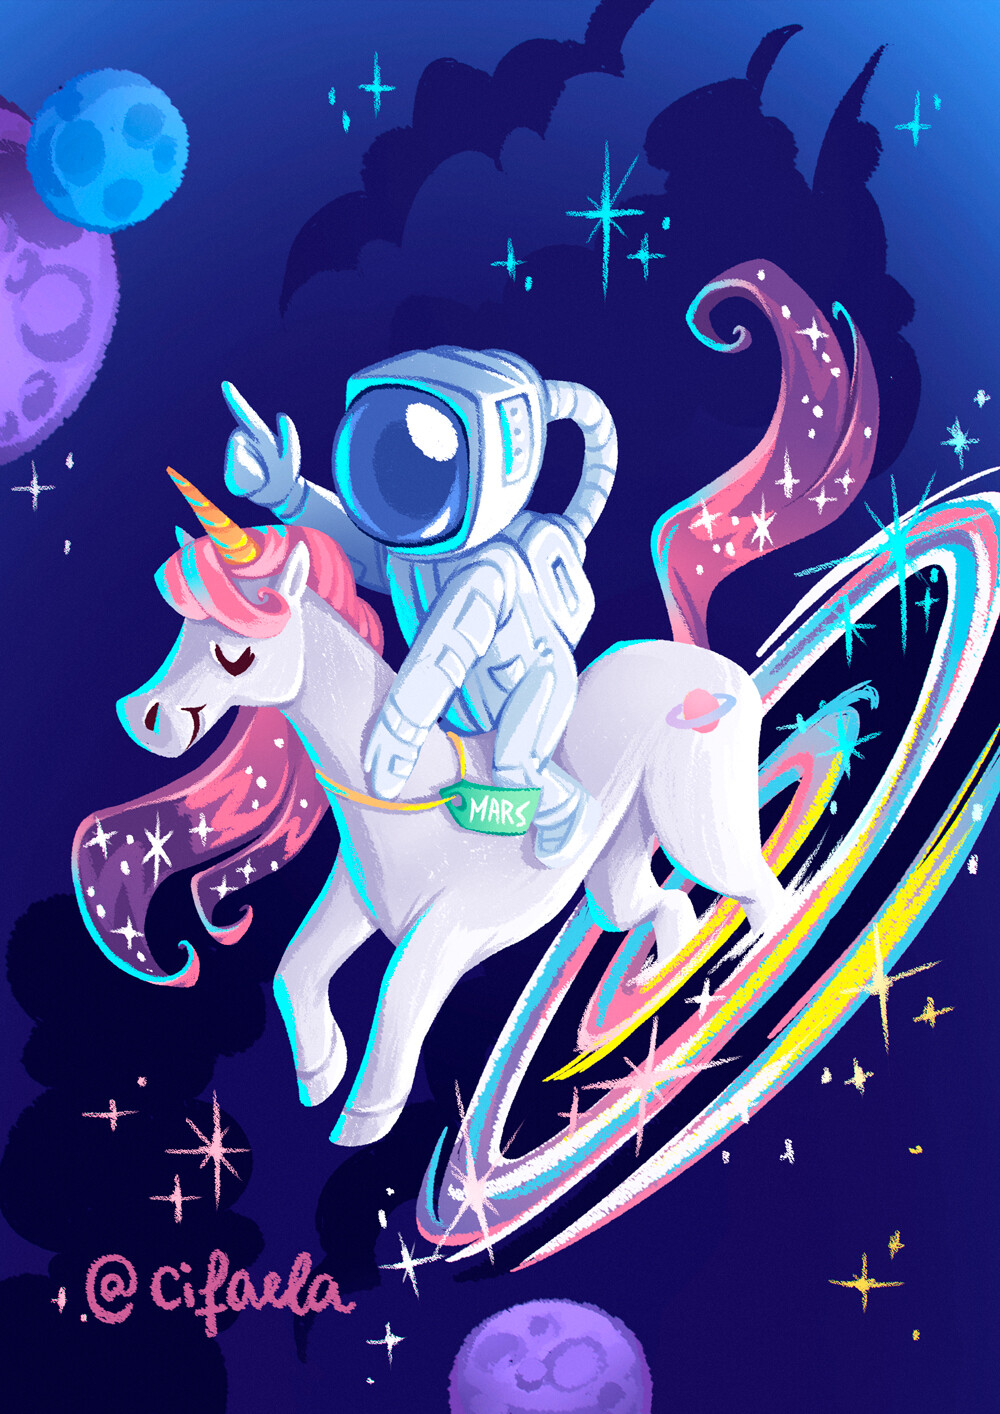 Fabiola monteiro unicorn astronaut space 1